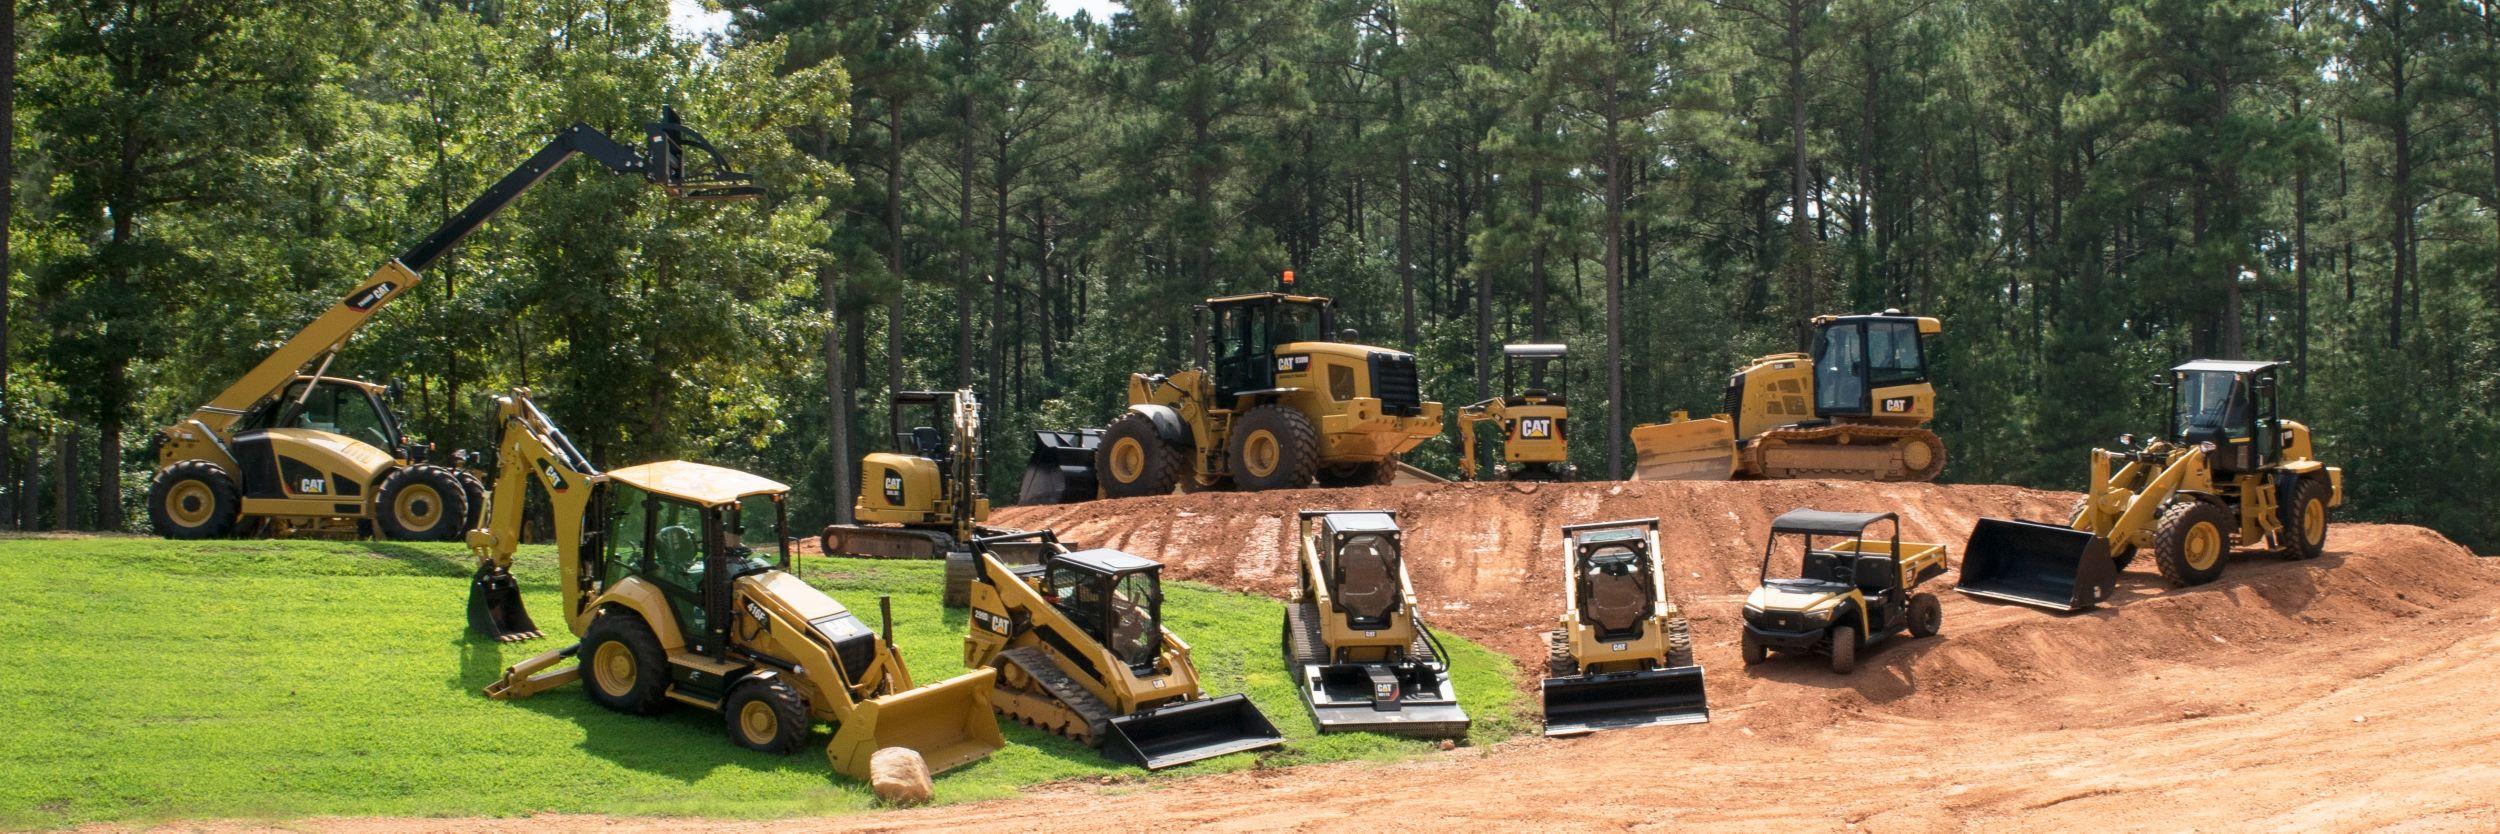 Cat Compact Construction Equipment